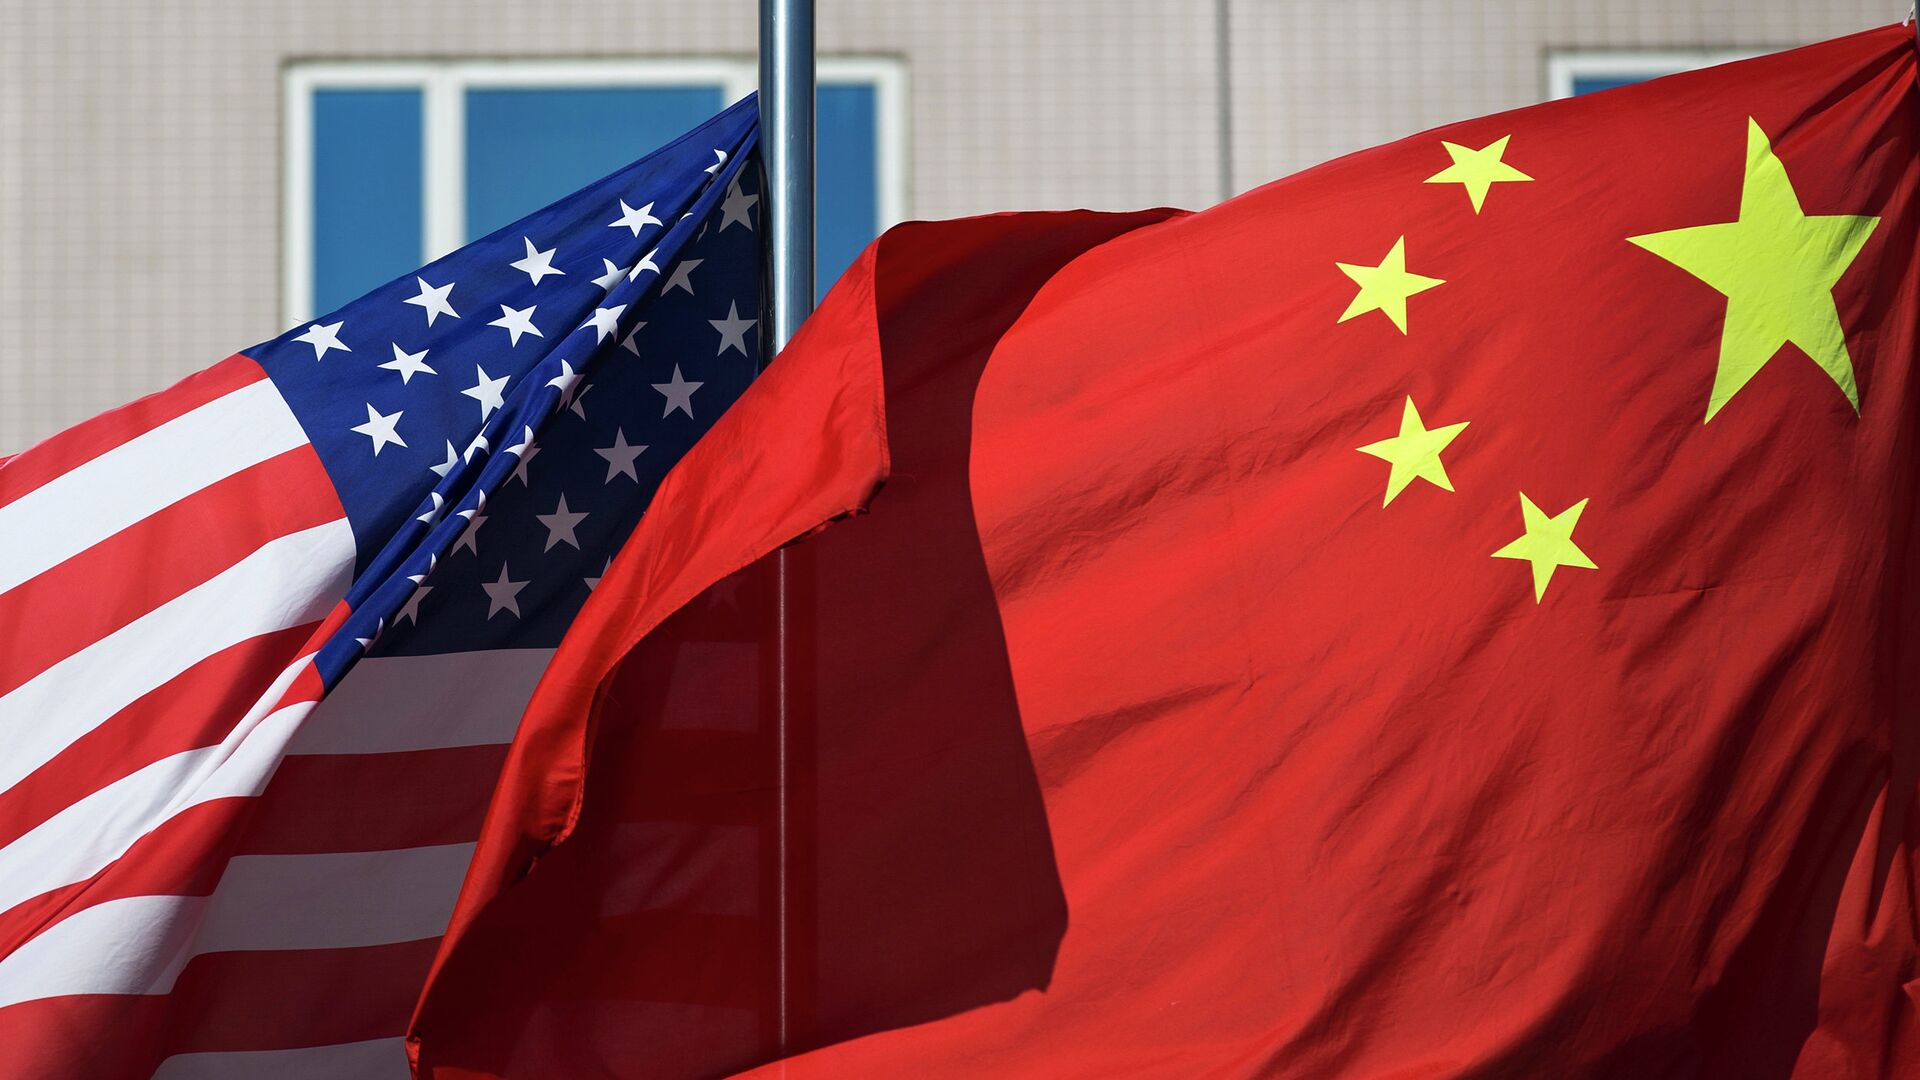 U.S. flag and China's flag flutter in winds at a hotel in Beijing Wednesday, Sept. 5, 2012 - Sputnik Mundo, 1920, 23.03.2021